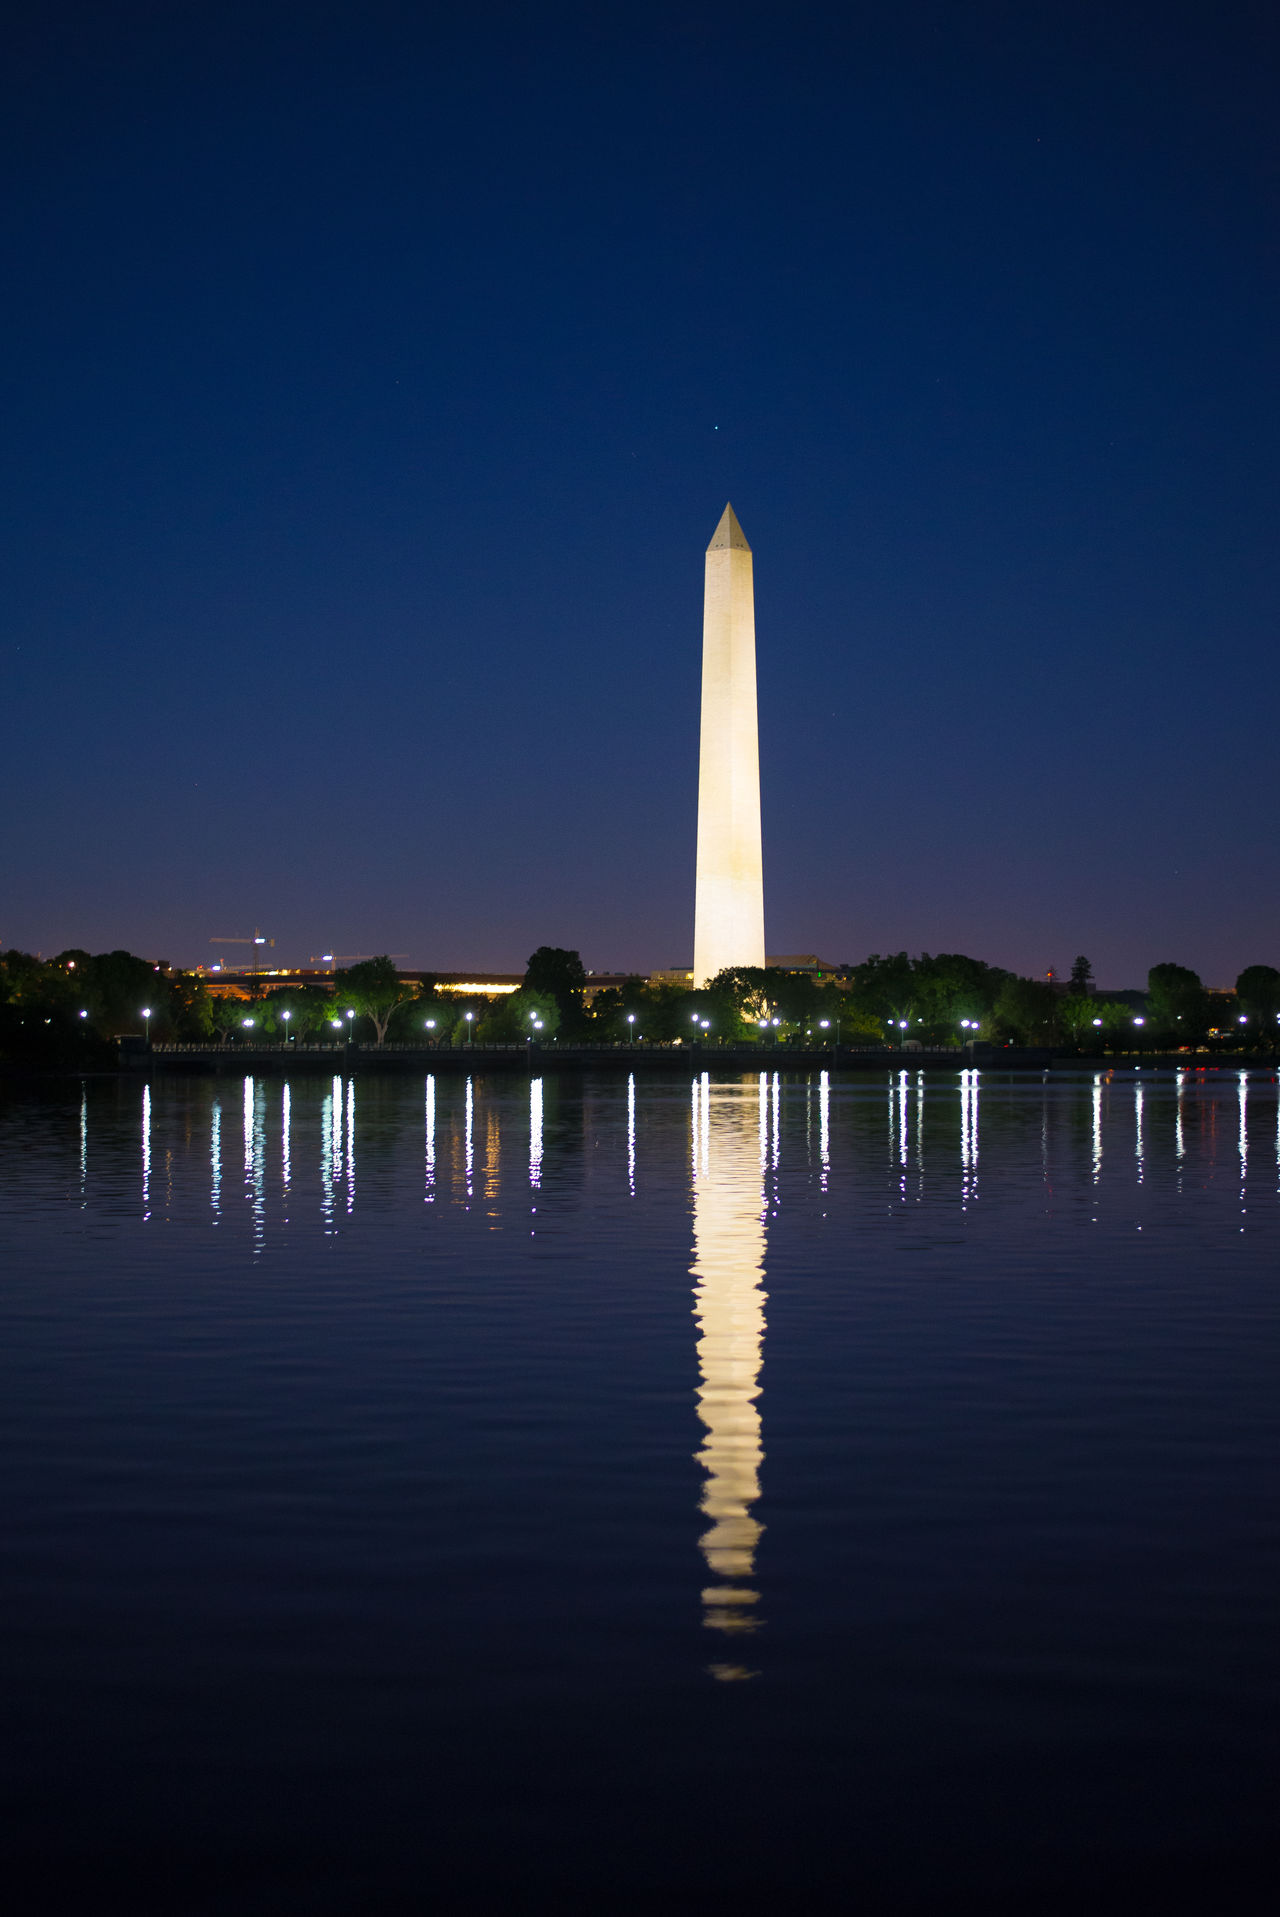 Architecture Clear Sky Illuminated Night Outdoors Reflection Travel Destinations Washington Monument From MLK Jr. Memorial  Washington Monument, Washington DC Washington, D. C. Water